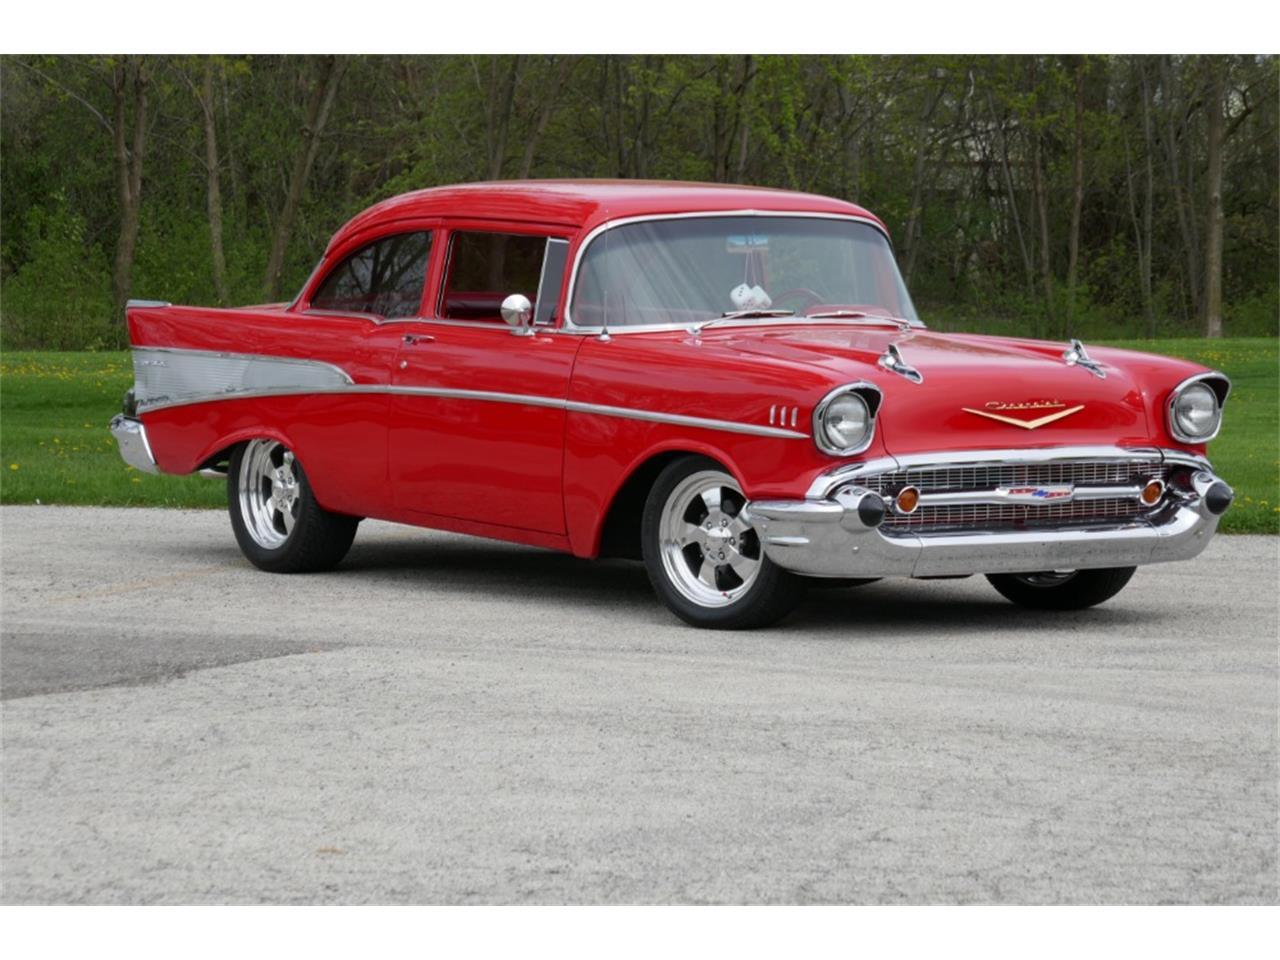 1957 Chevrolet Bel Air For Sale Classiccars Com Cc 1068145